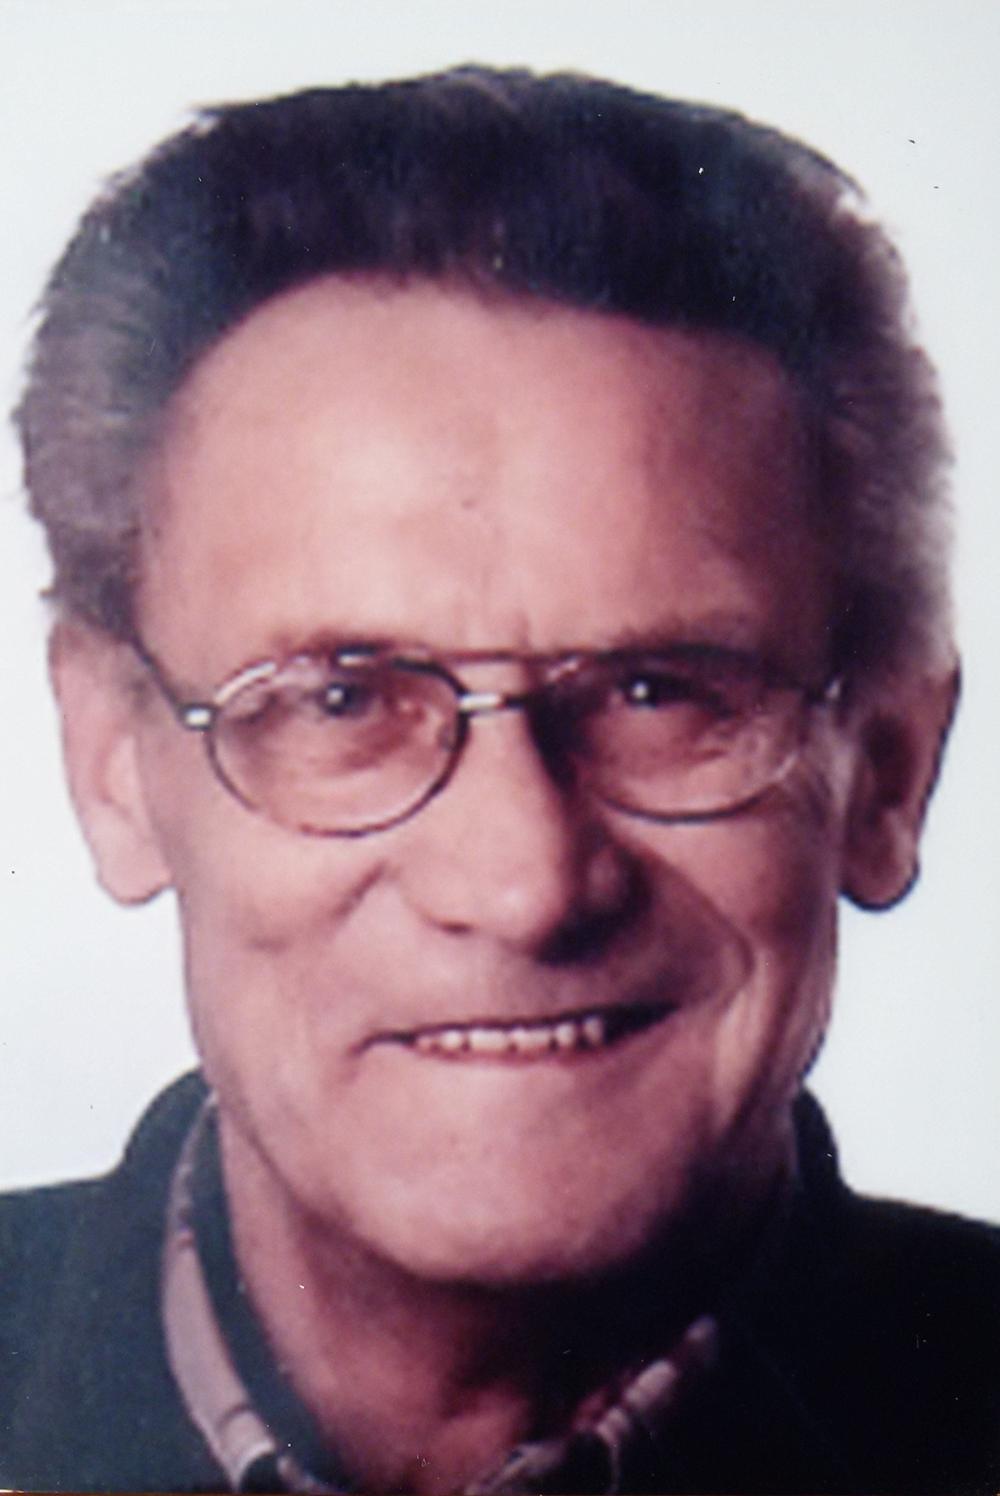 Jan Lankveld